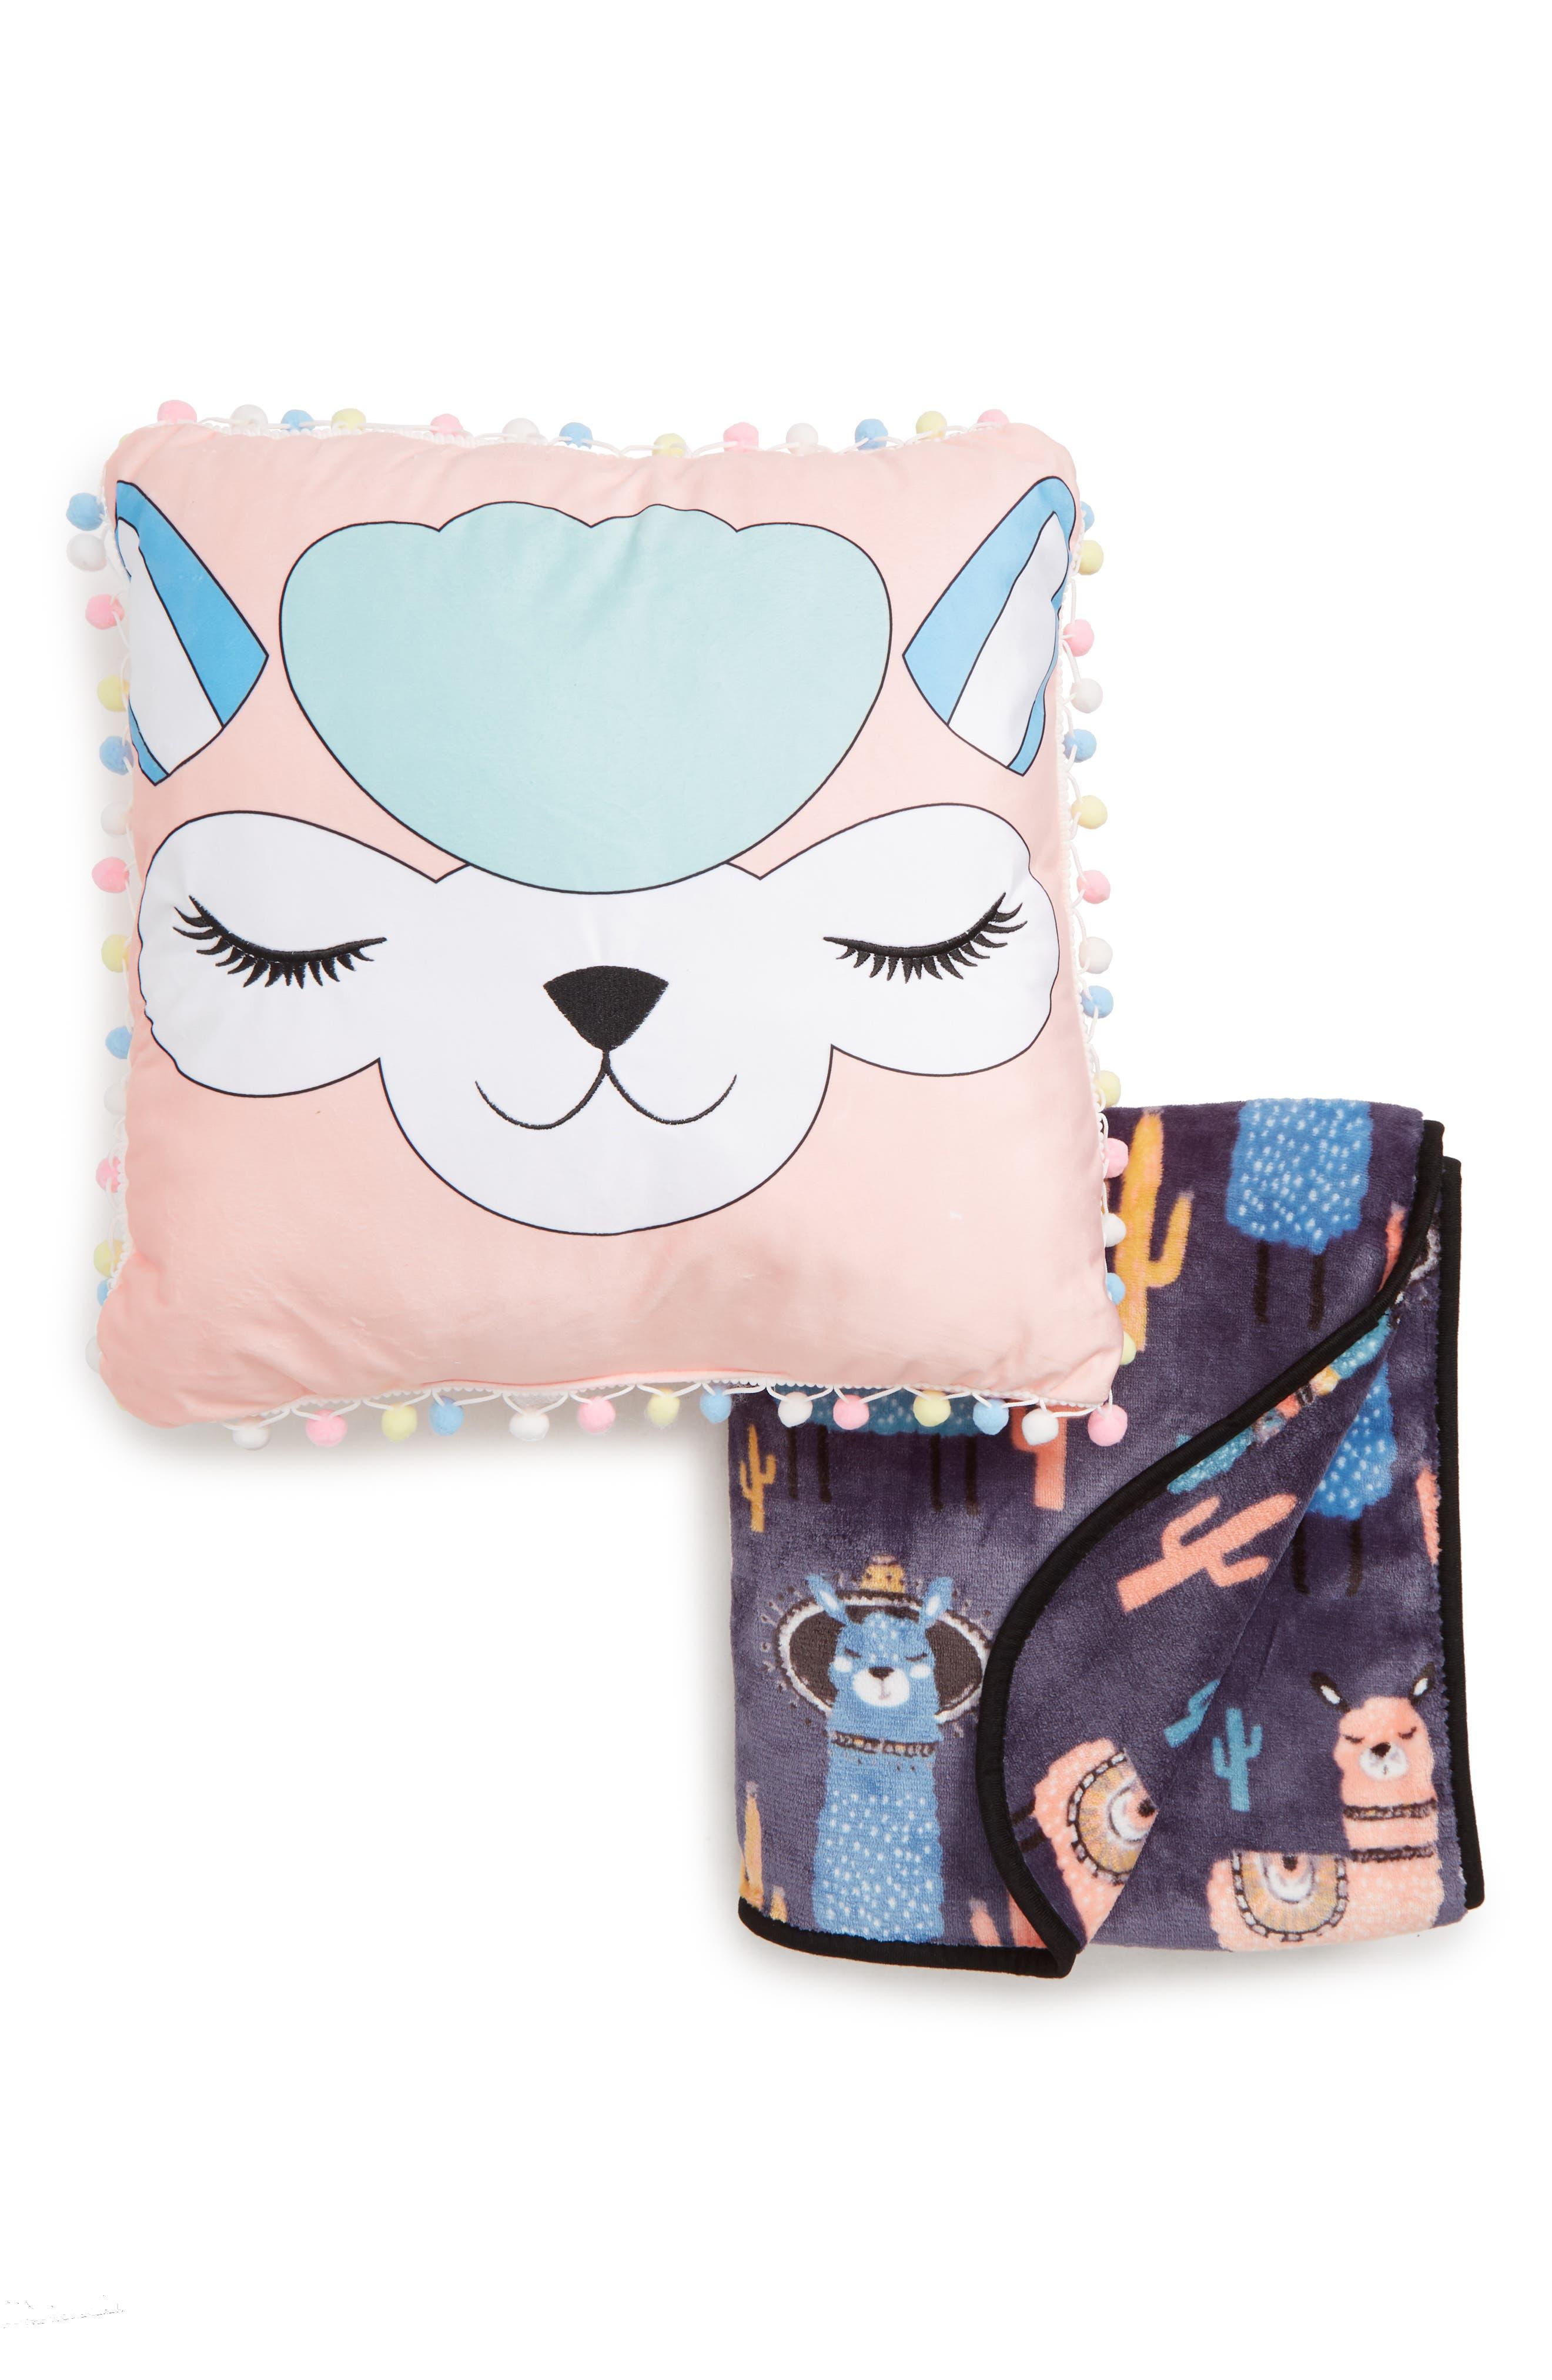 Under One Sky Alpaca Throw  Pillow Set Size One Size  Pink